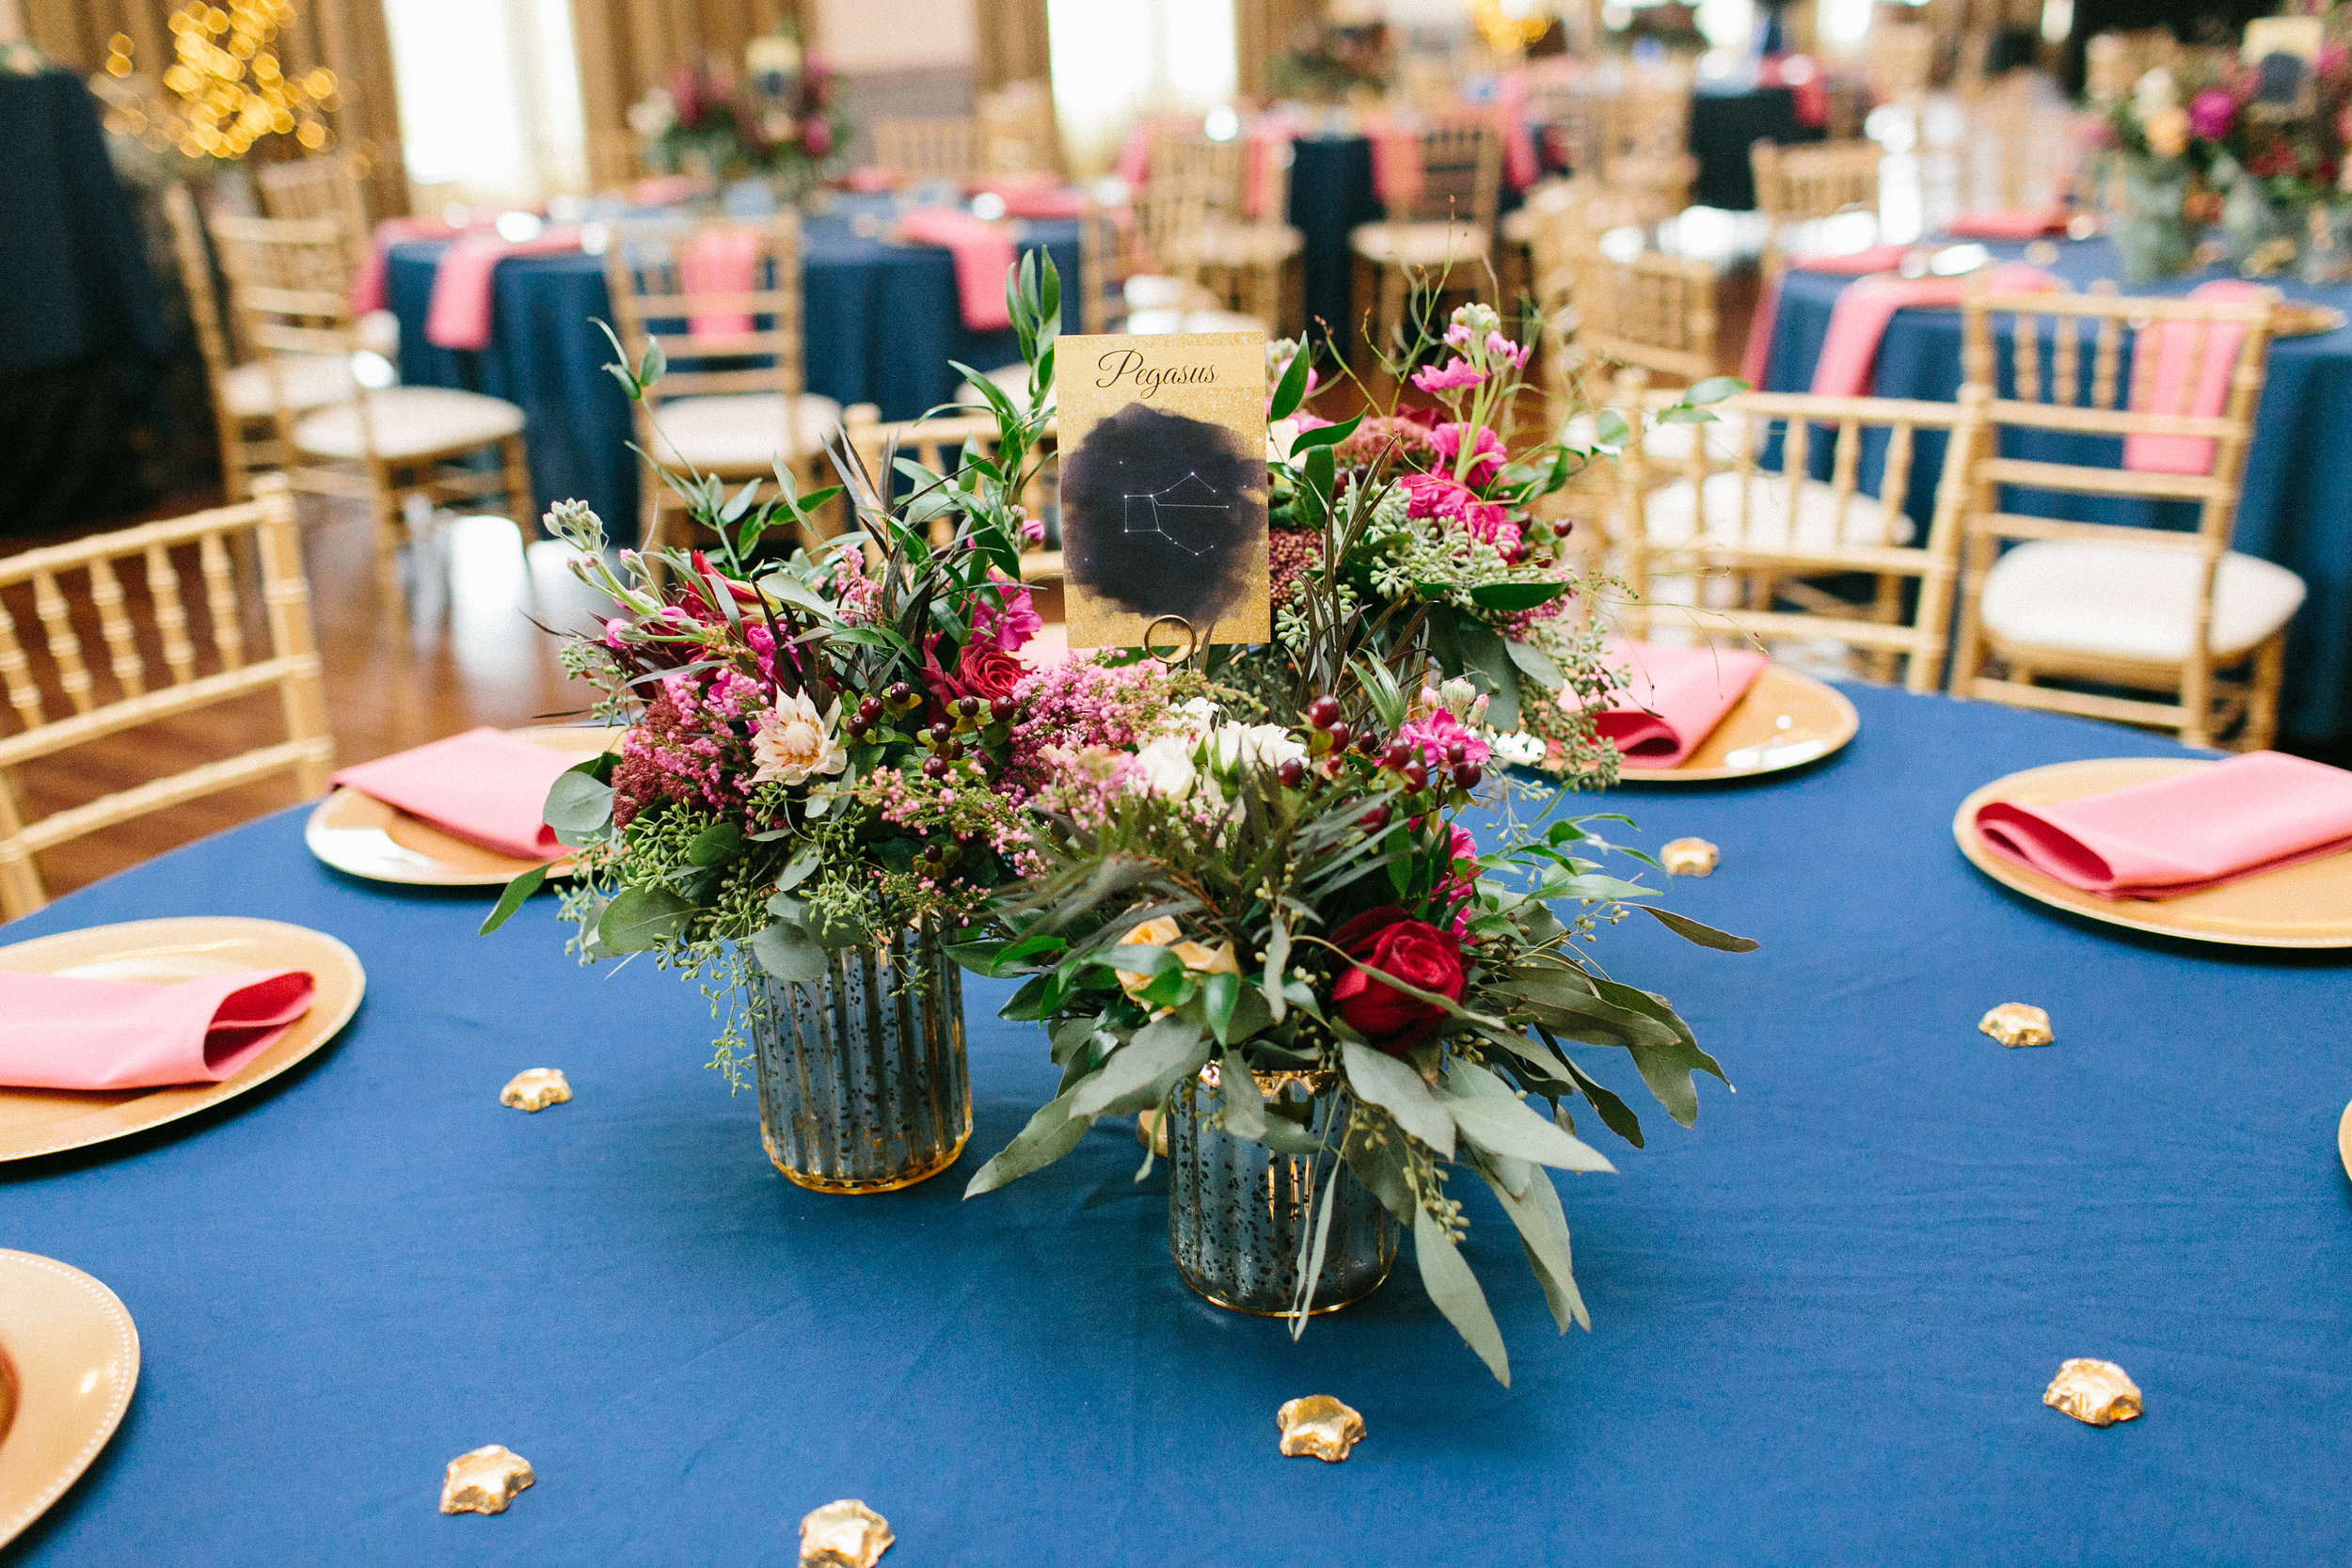 2017_Carly_Milbrath_Jefferson_Street_Inn_Wedding_Wausau_WI_003.JPG